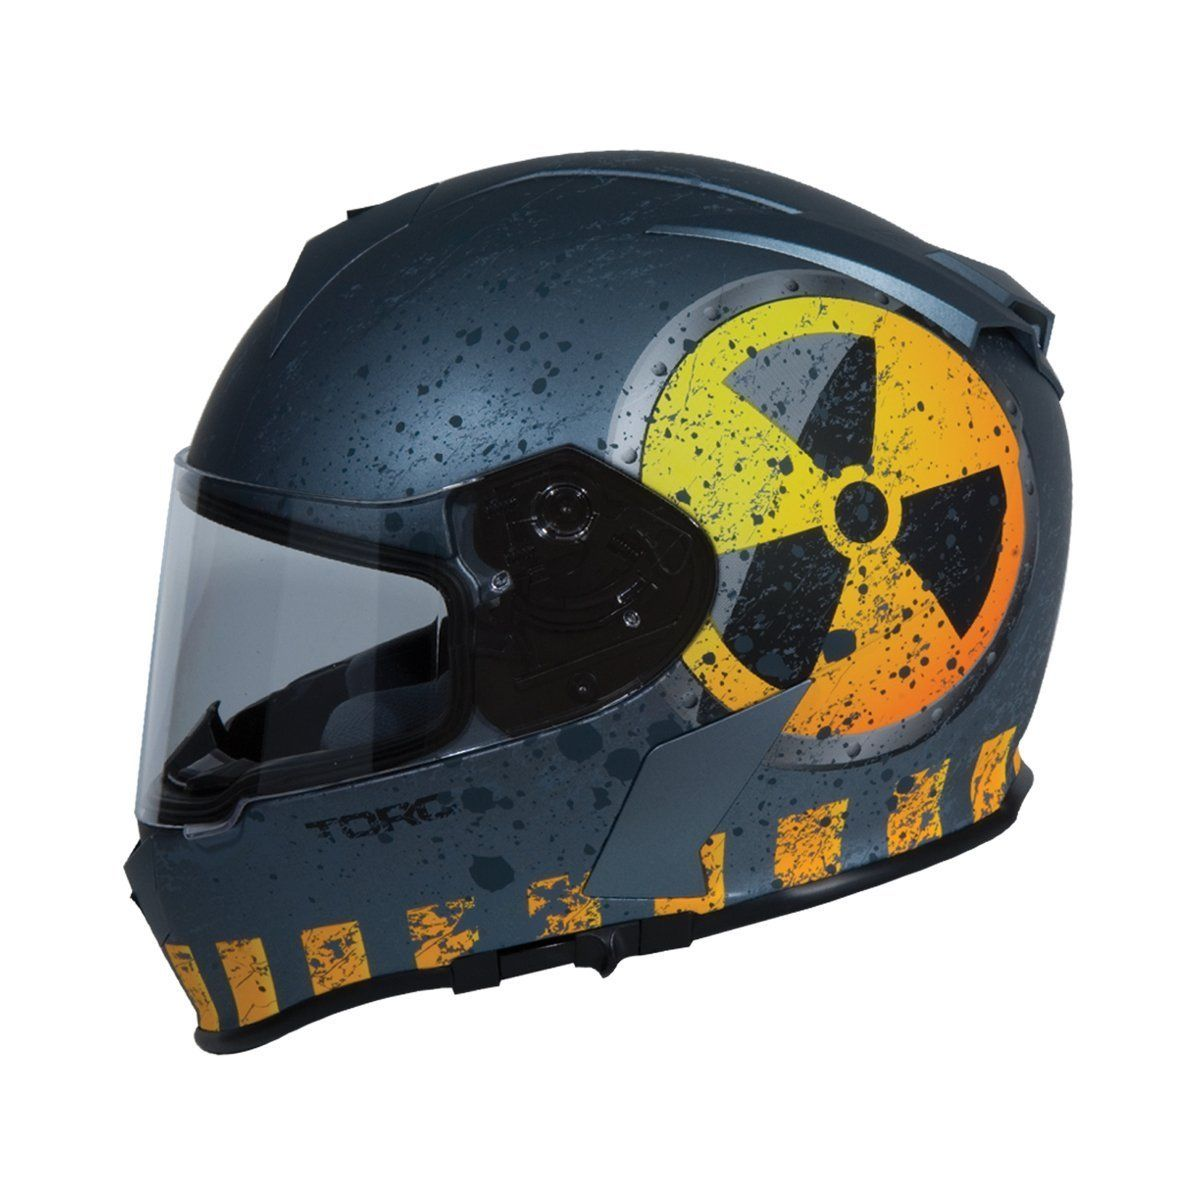 3e5c29c1 TORC T14 Mako Nuke Full Face Helmet Flat Grey | Products | Bluetooth ...